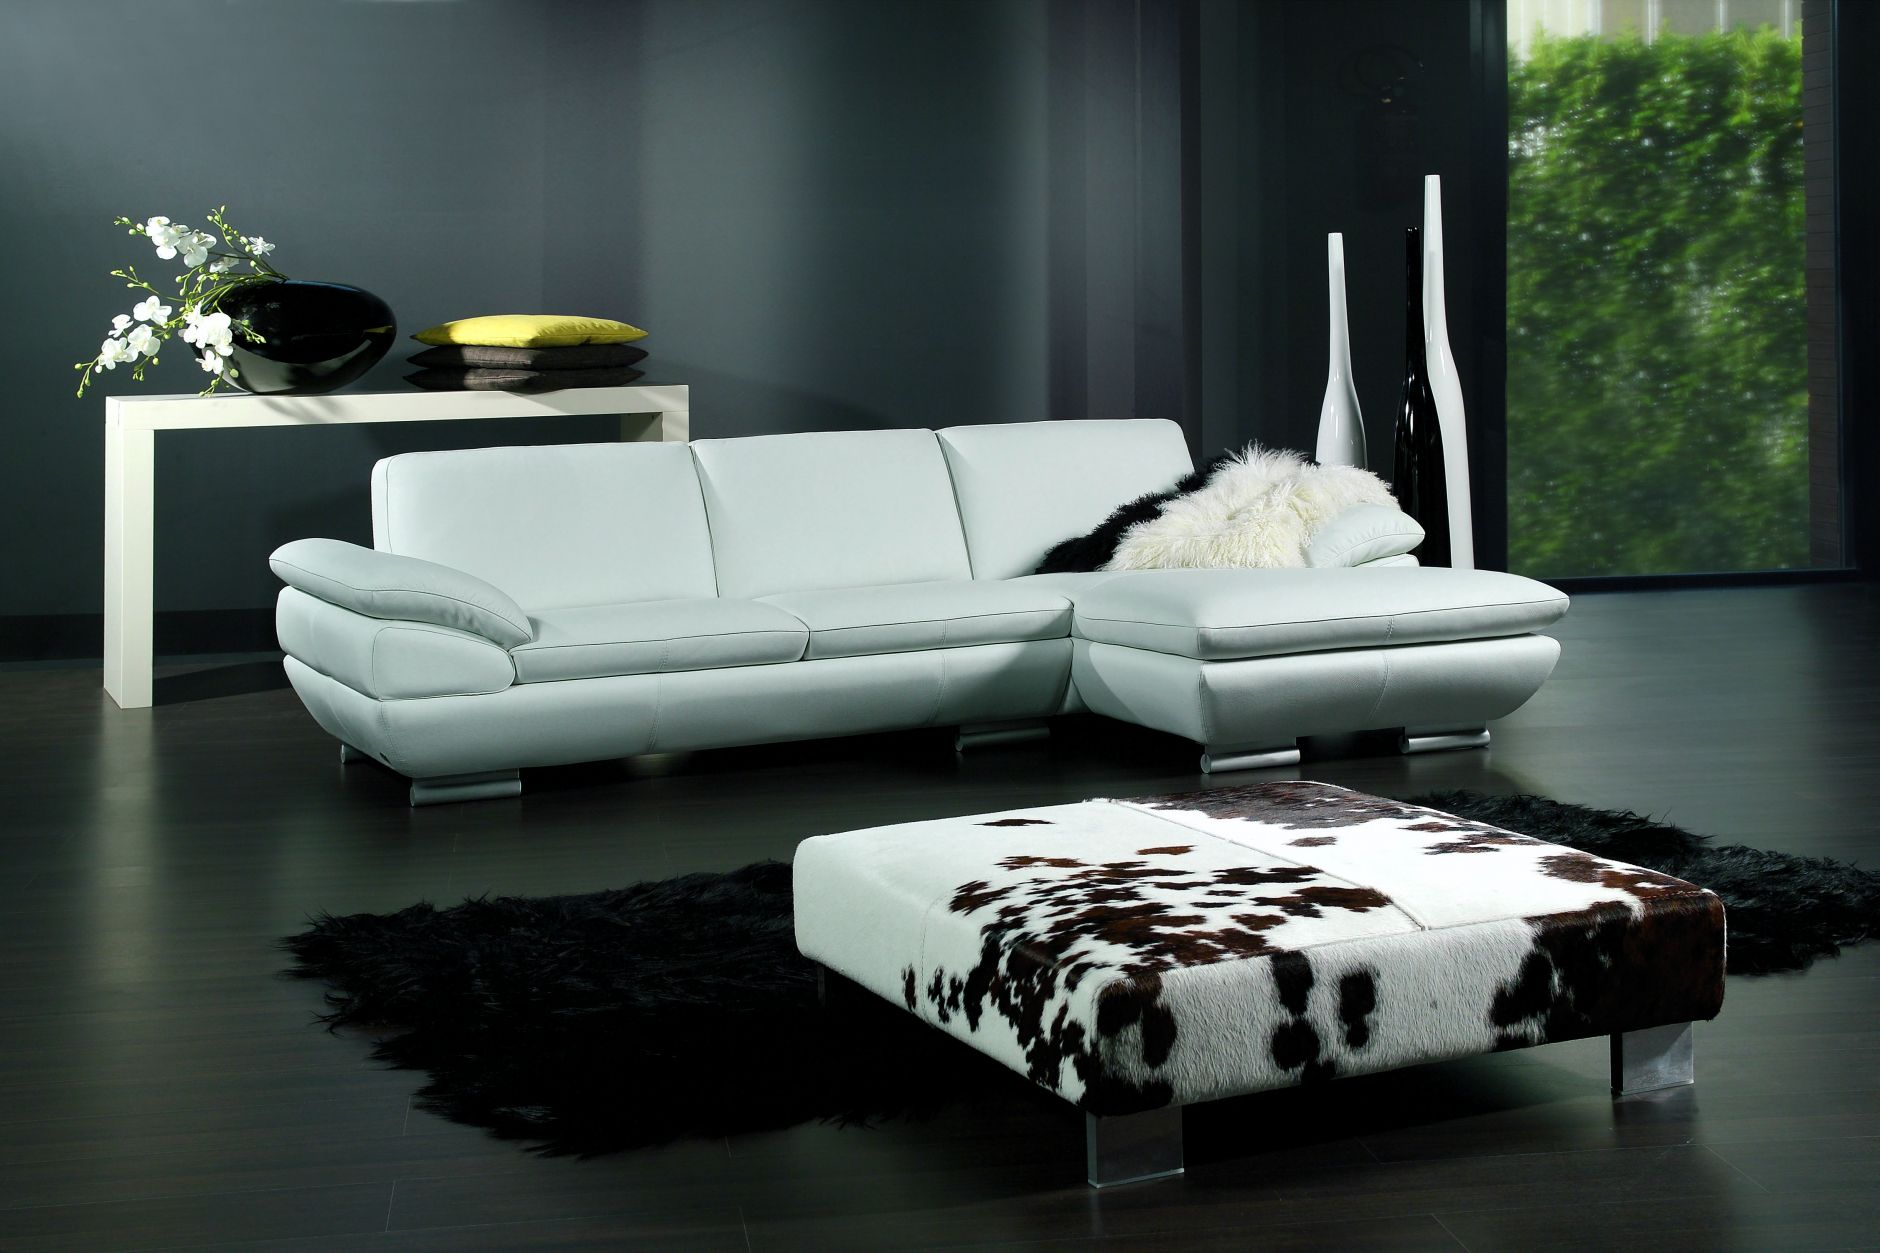 sectional sofas sectional sofa calia italia glamour 269. Black Bedroom Furniture Sets. Home Design Ideas